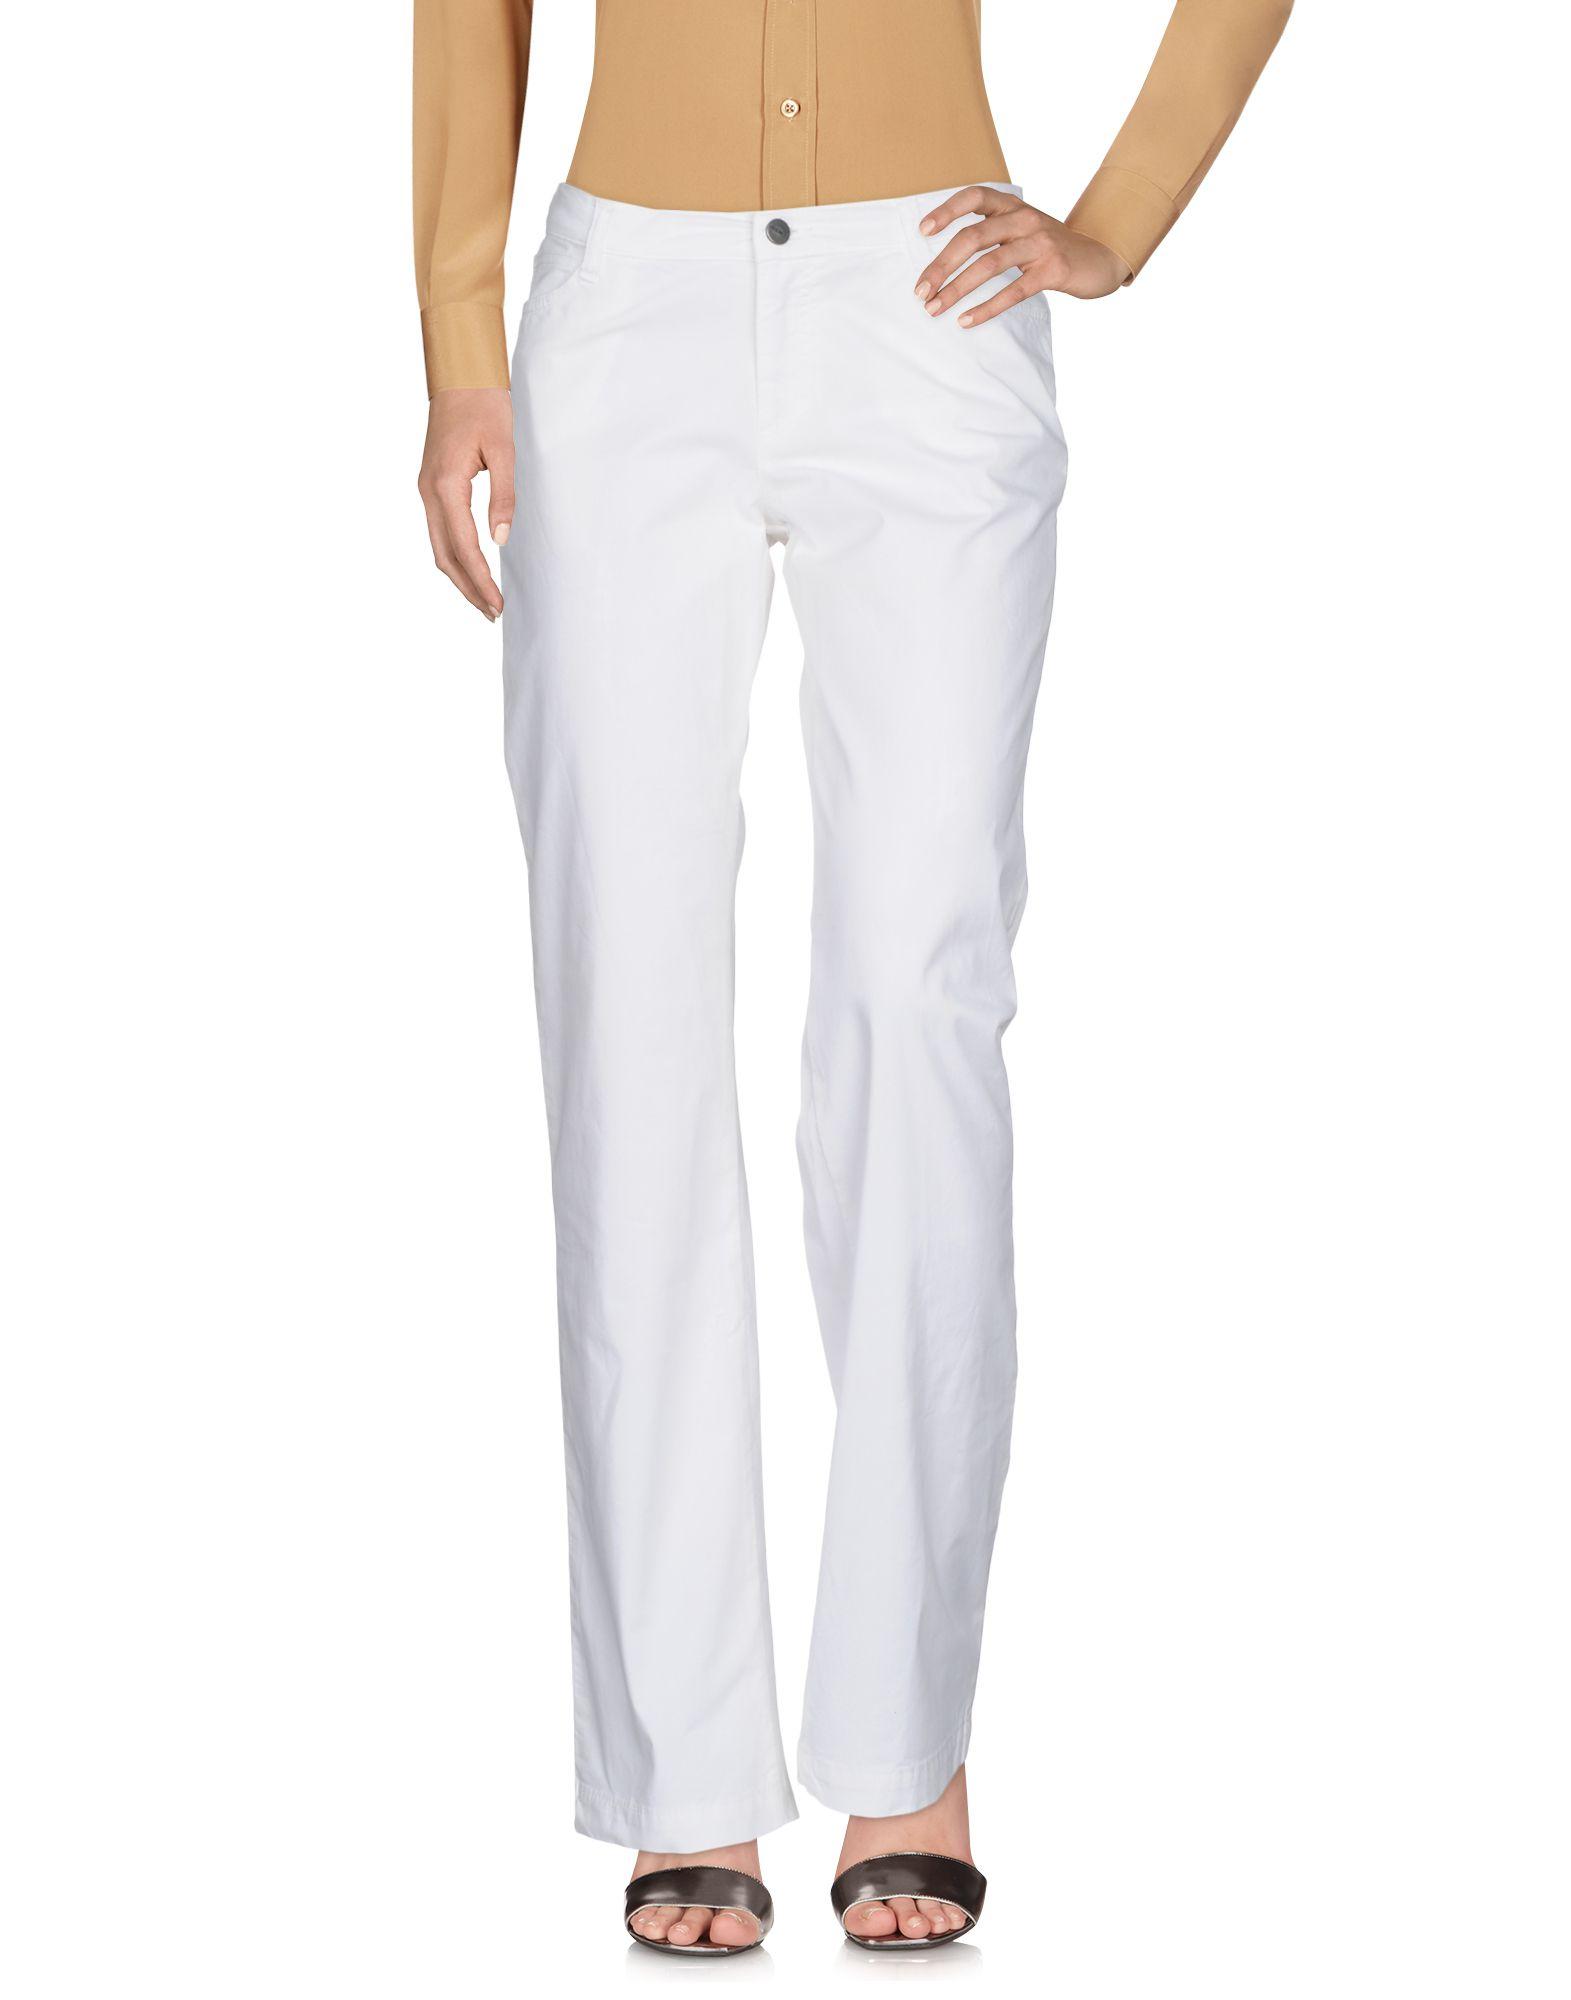 Pantalone Incotex Donna - Acquista online su e9d5u1ugI